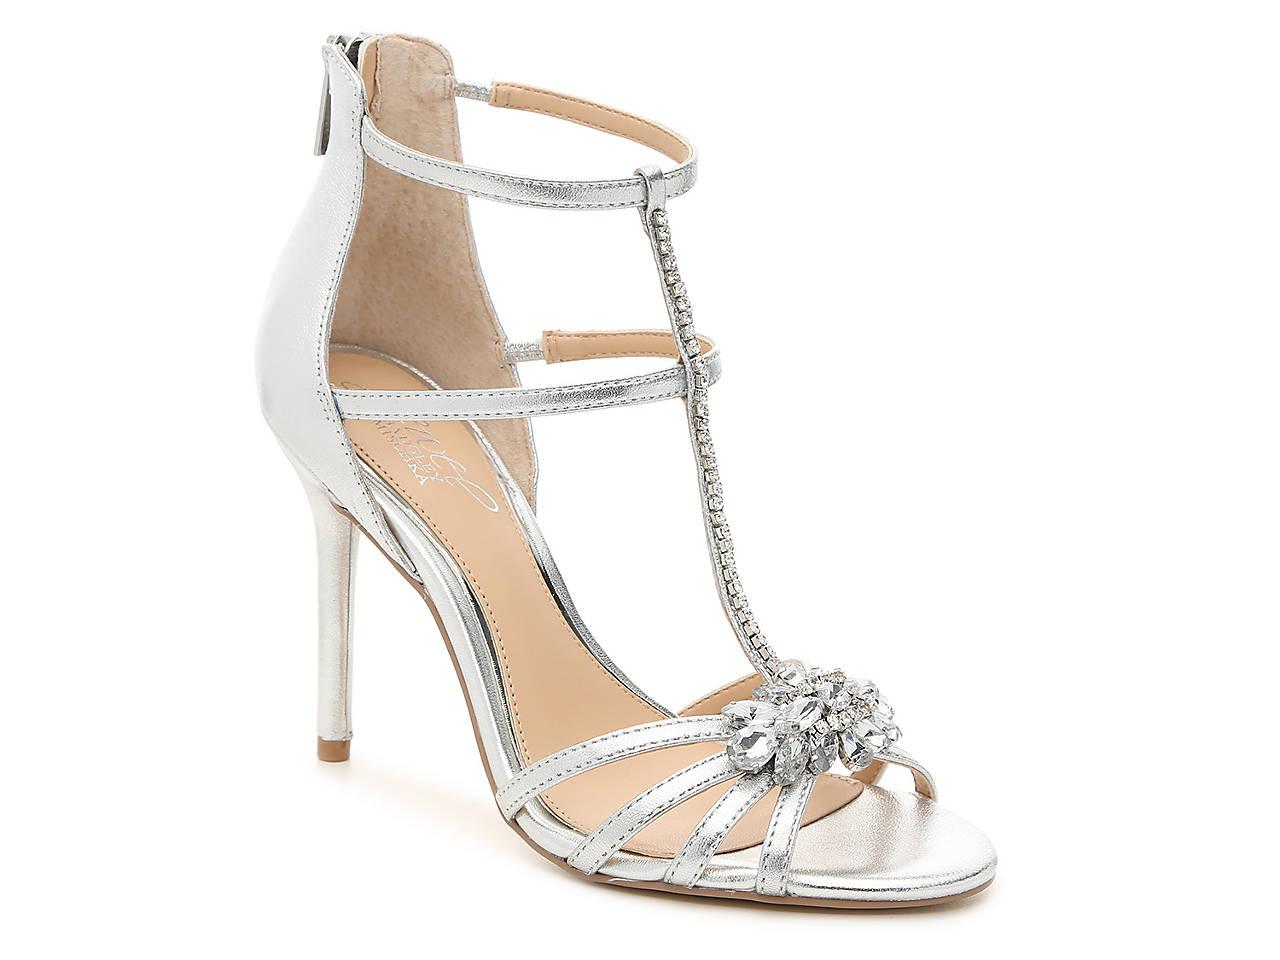 Jewel Badgley Mischka Hazel Embellished T-Strap Sandal Lx3luW